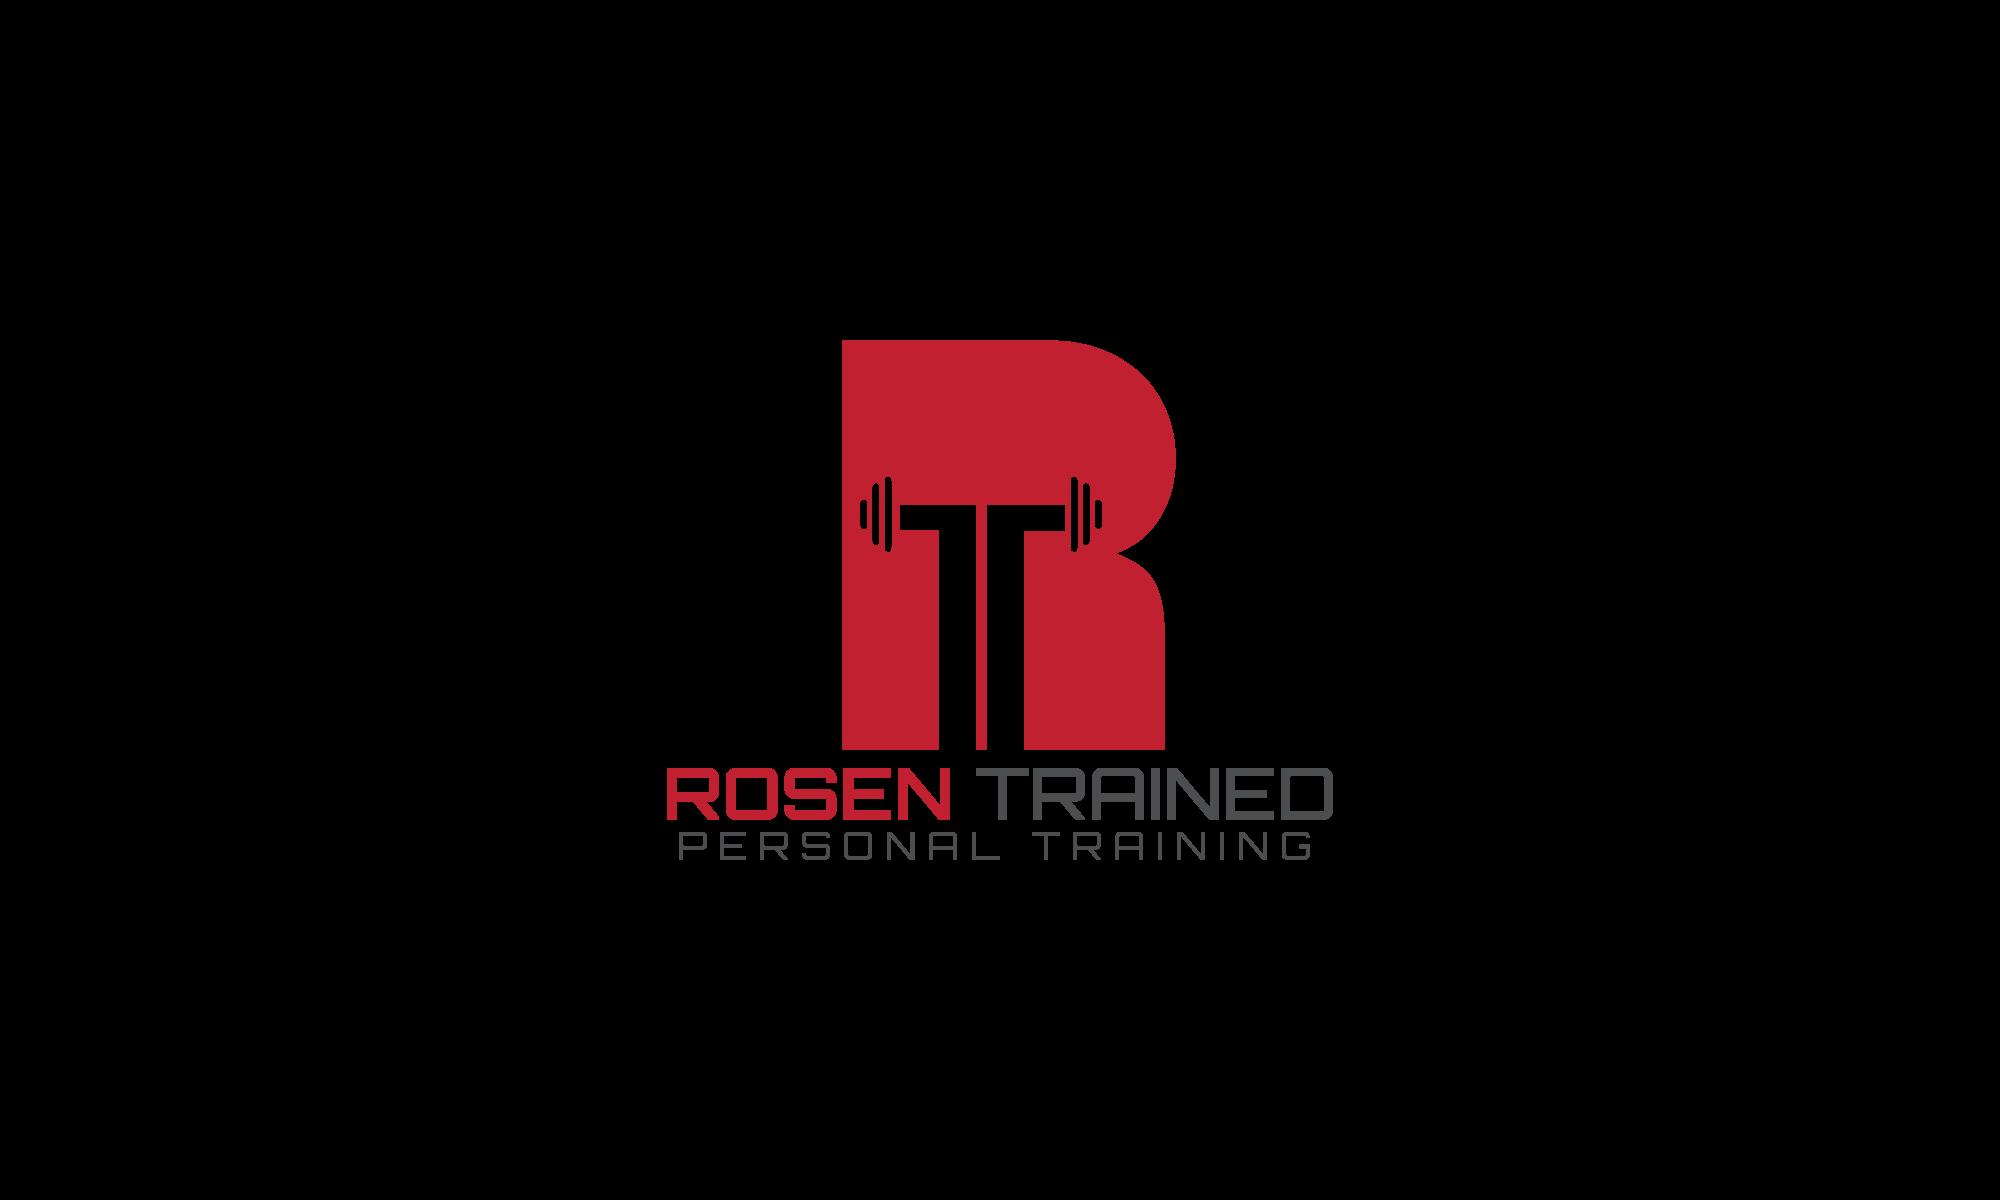 RosenTrainedPersonalTraining.png